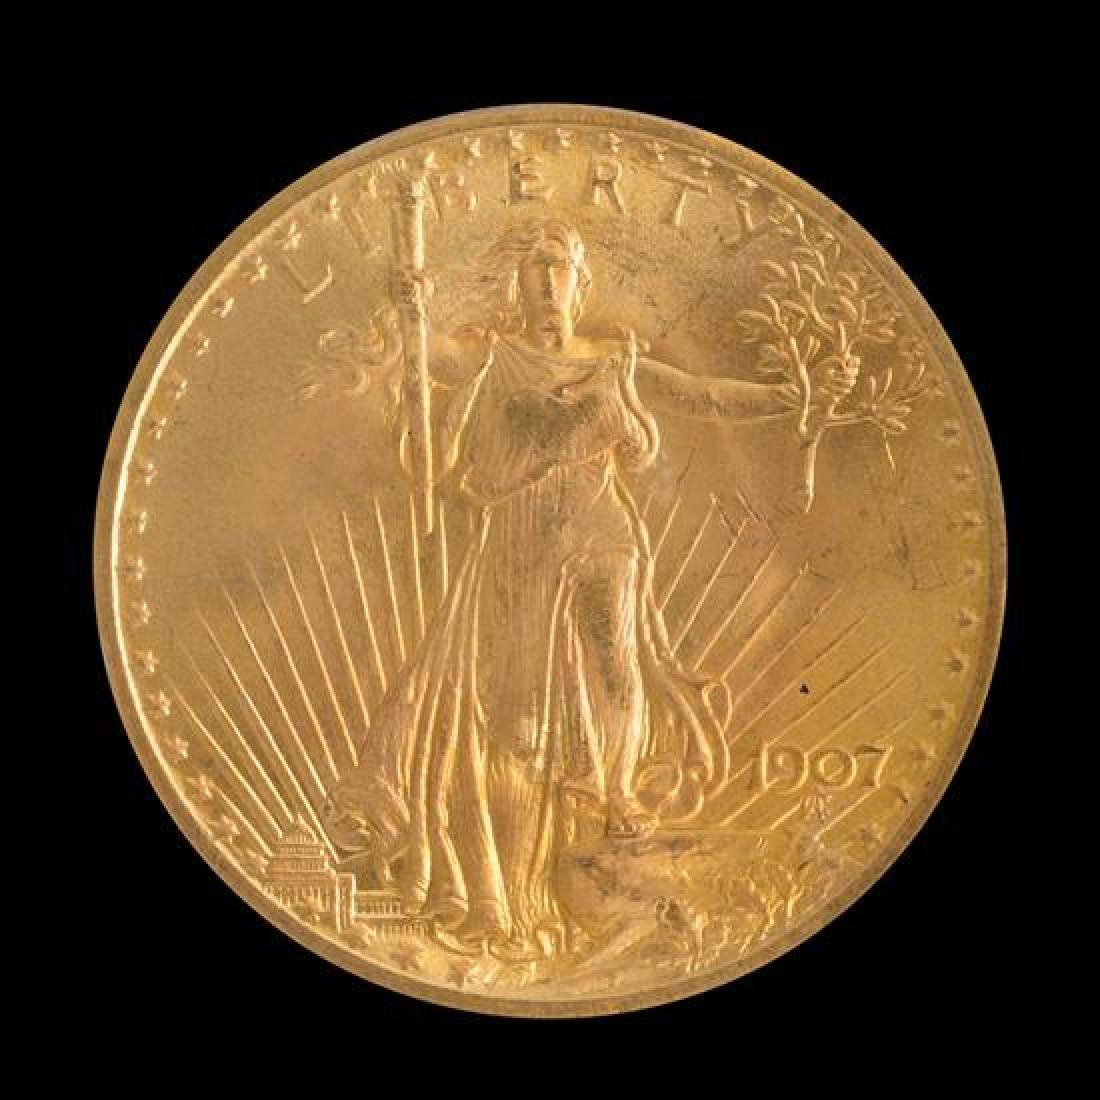 A United States 1907 Saint-Gaudens $20 Gold Coin